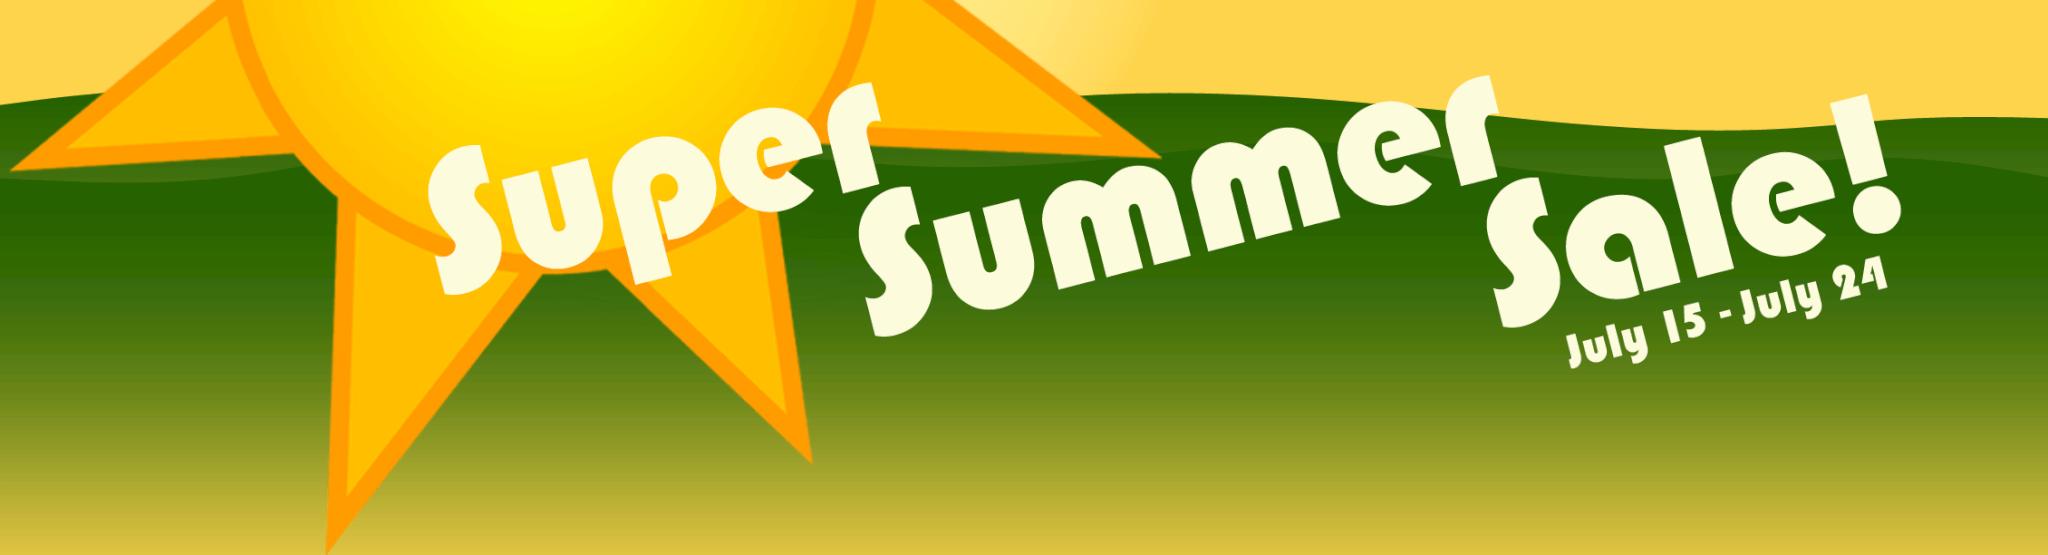 Super Summer Sale 2016 beim MacGameStore (Bildrechte: MacGameStore)